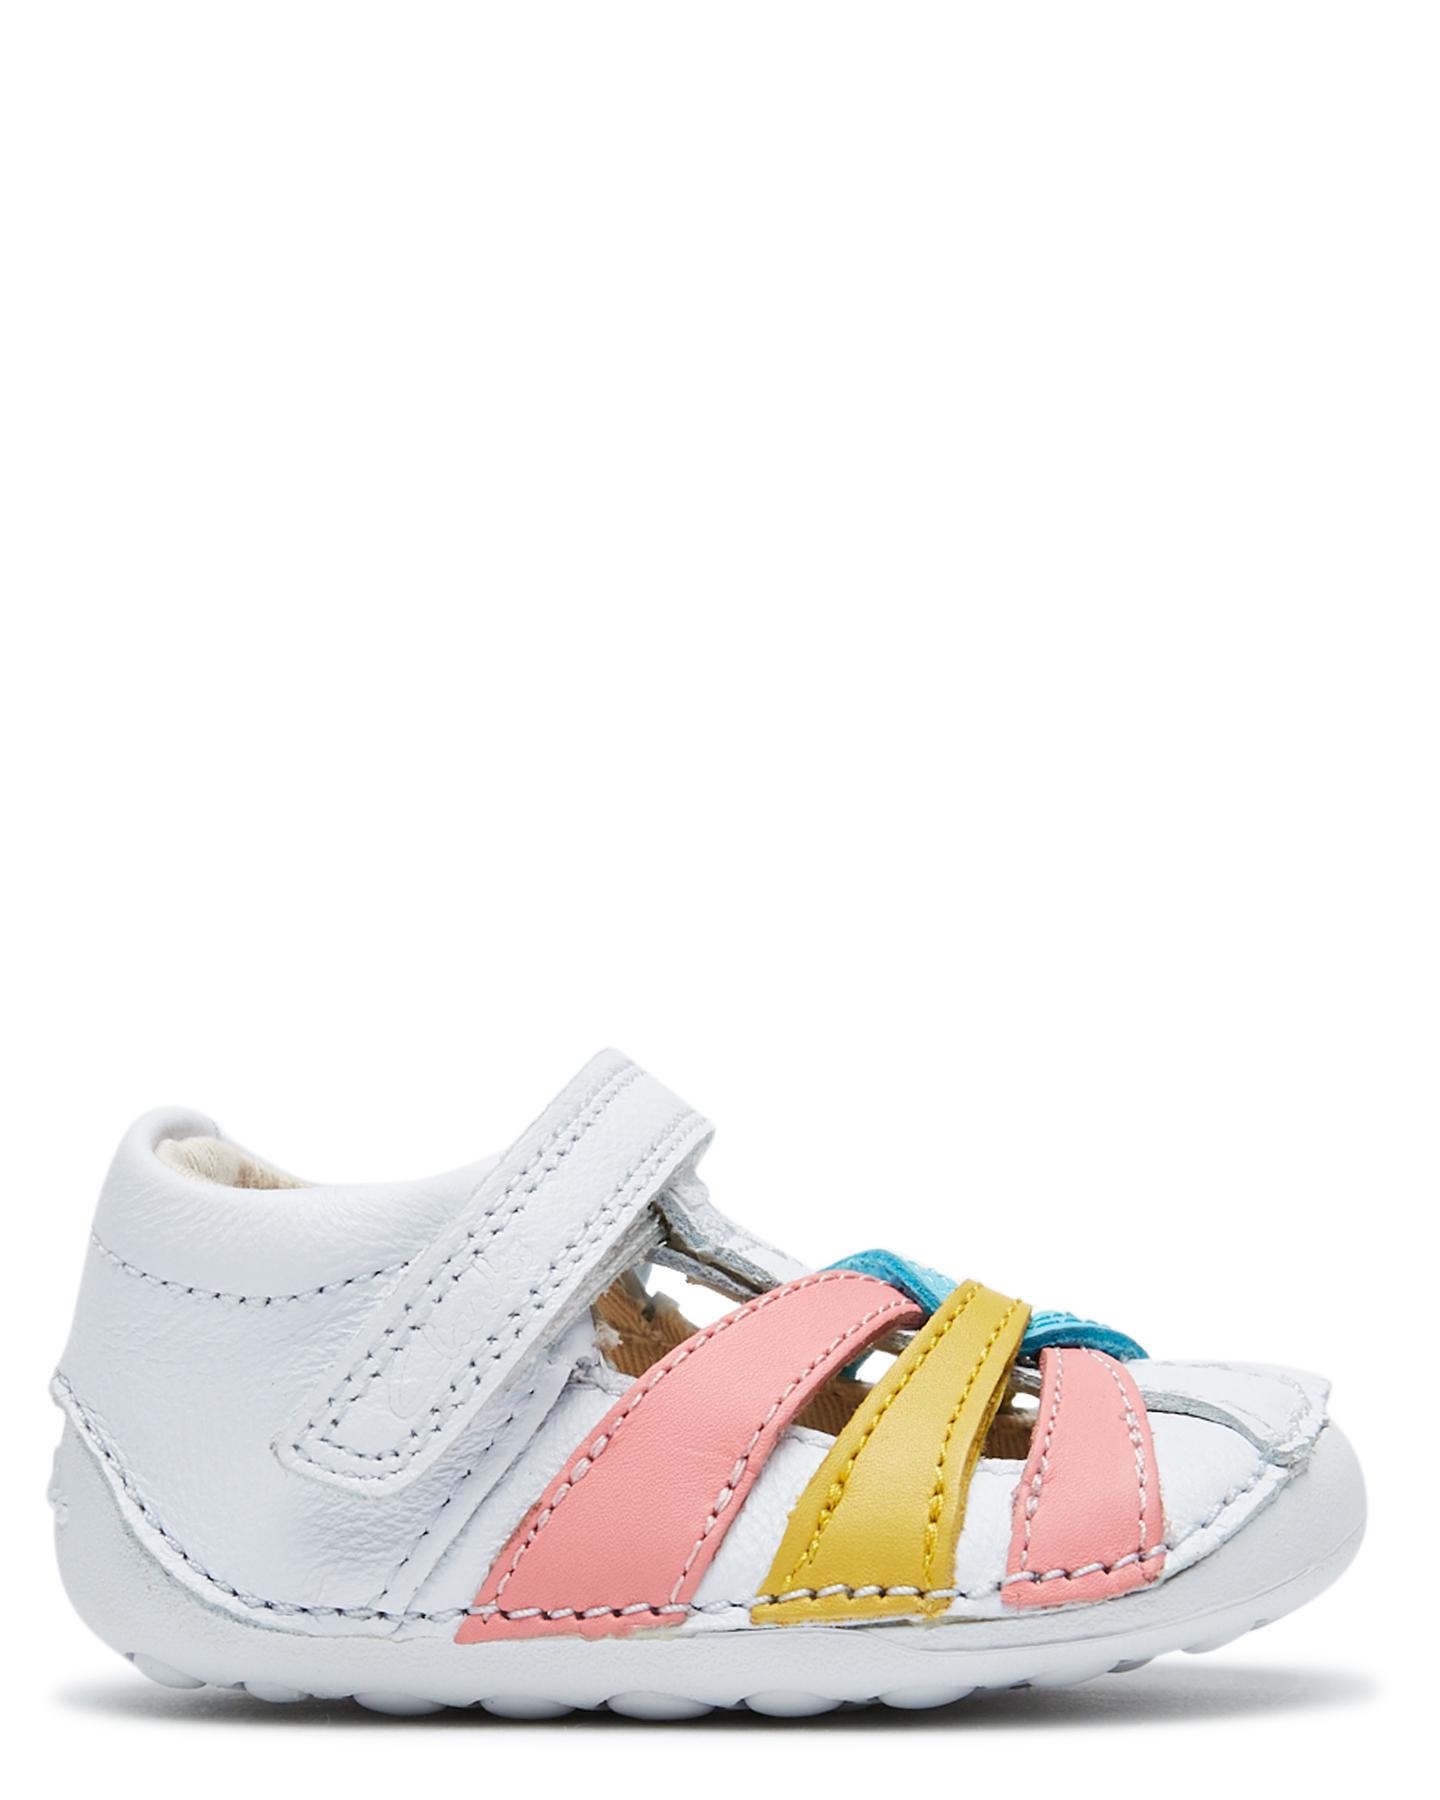 Clarks Girls Tiny Mae Shoe- Toddler White Combo